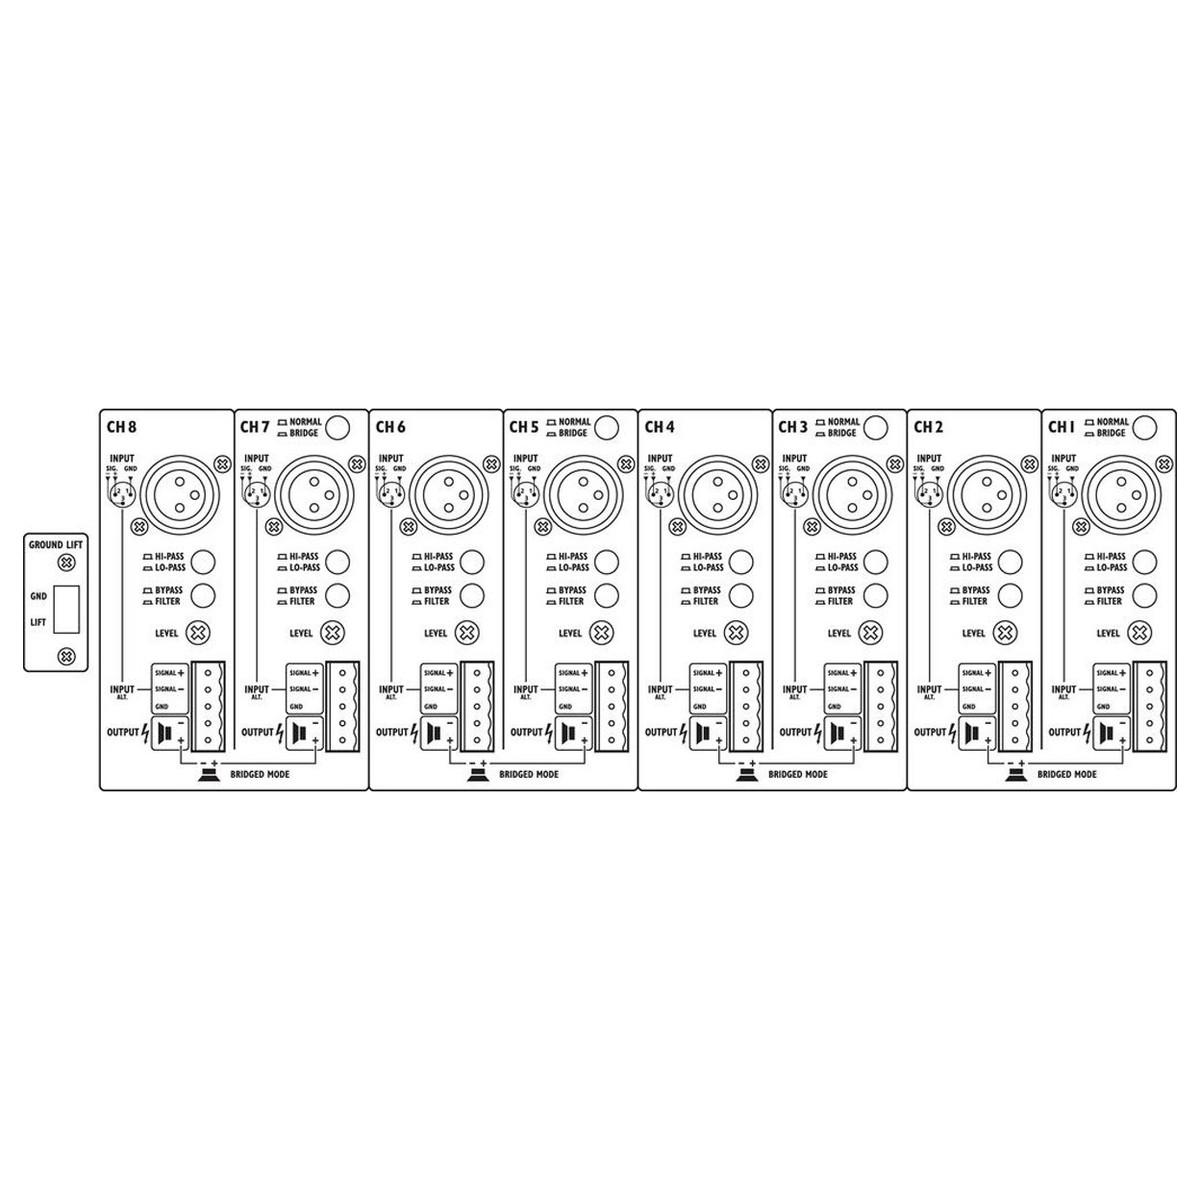 Monacor Sta 1508 1280w Power Amplifier At Gear4musiccom Bridging Adapter For Amplifiers Amp